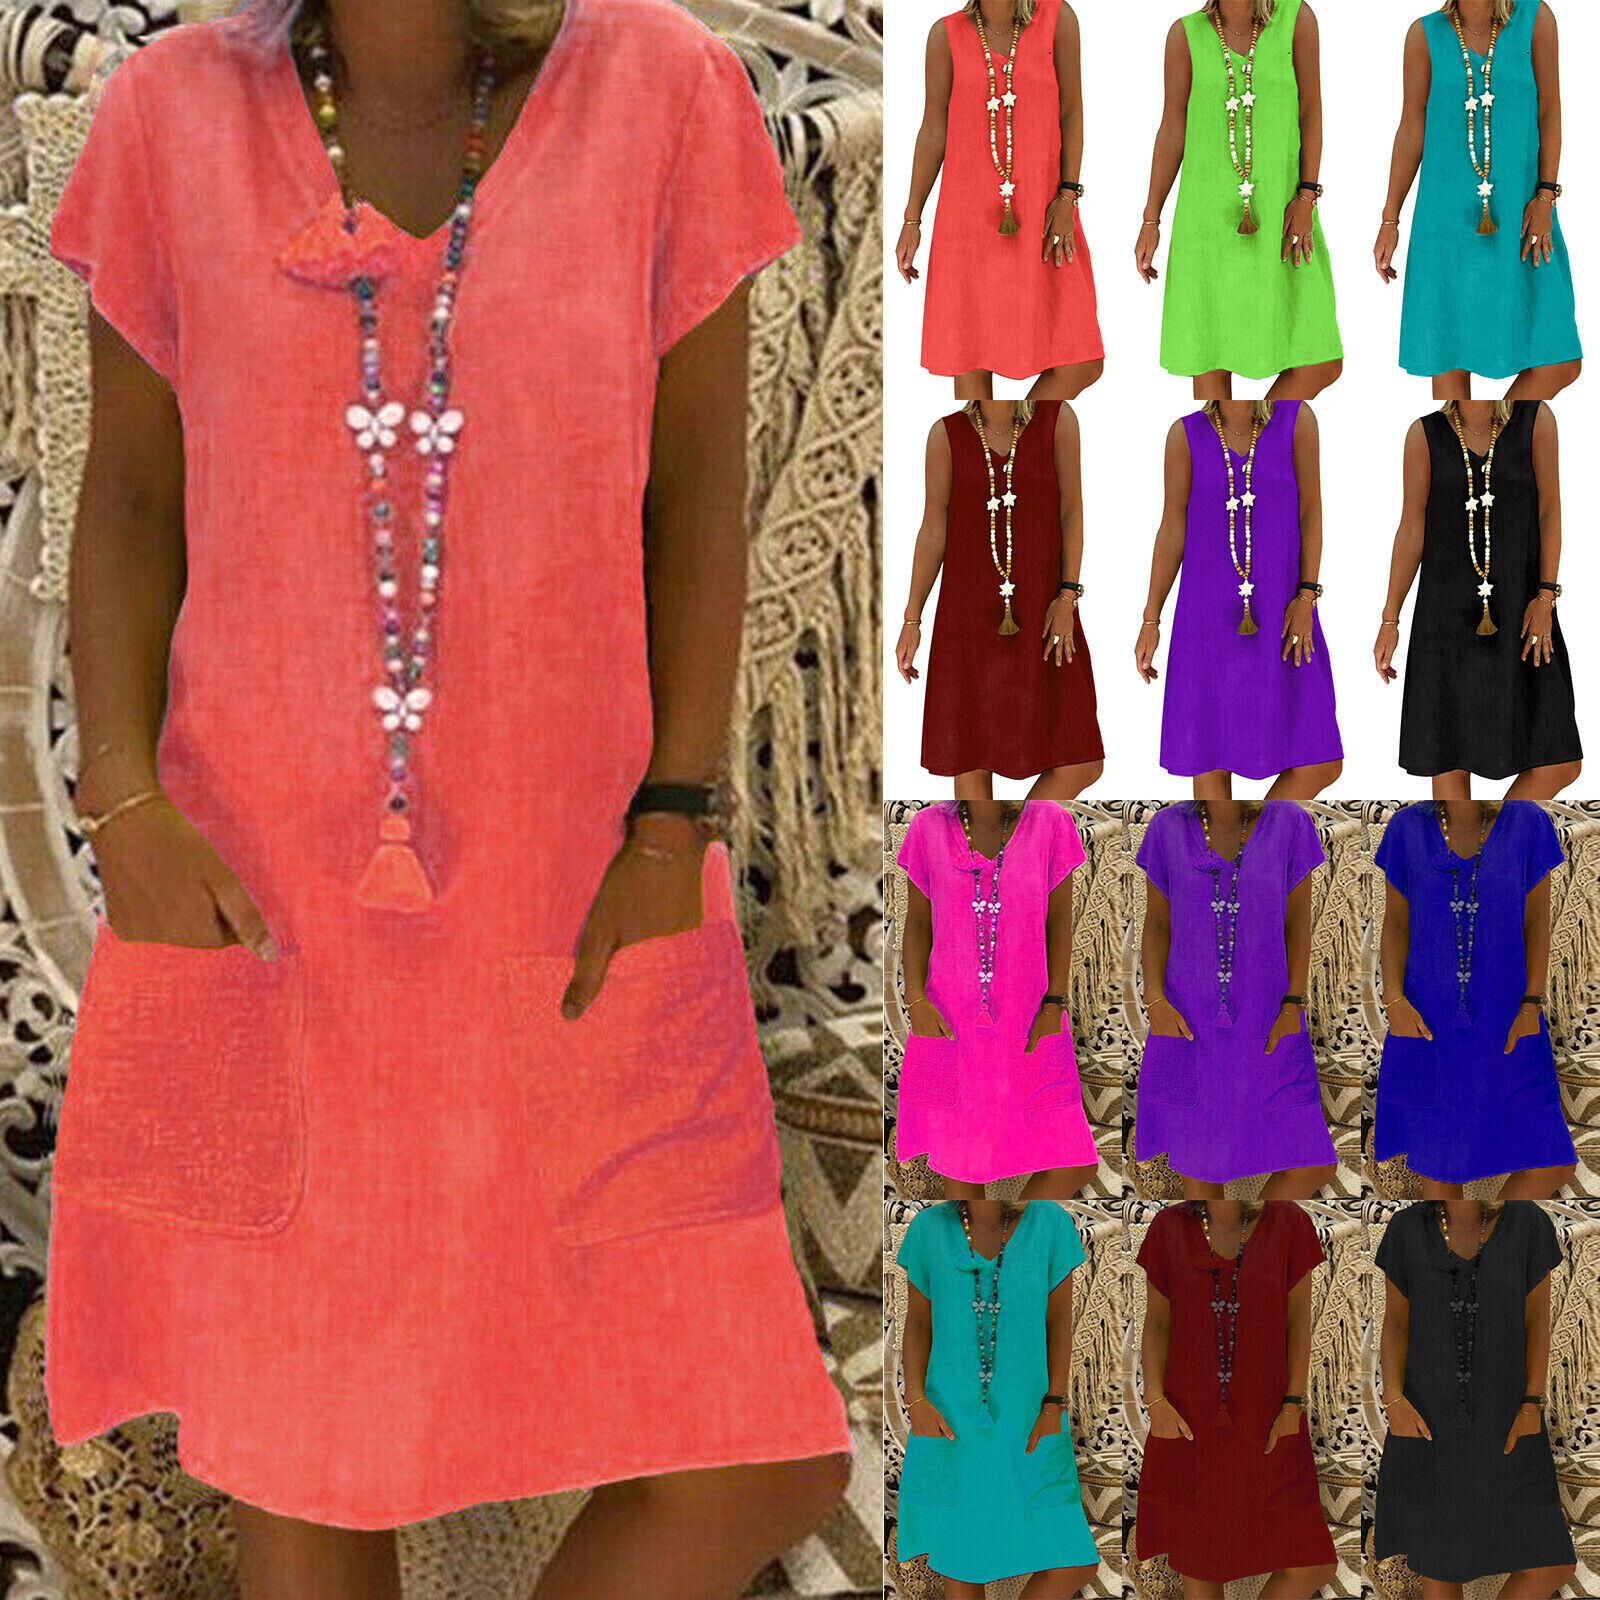 Plus Size Women's Cotton Linen T-Shirt Mini Dress V Neck Holiday Beach Sundress